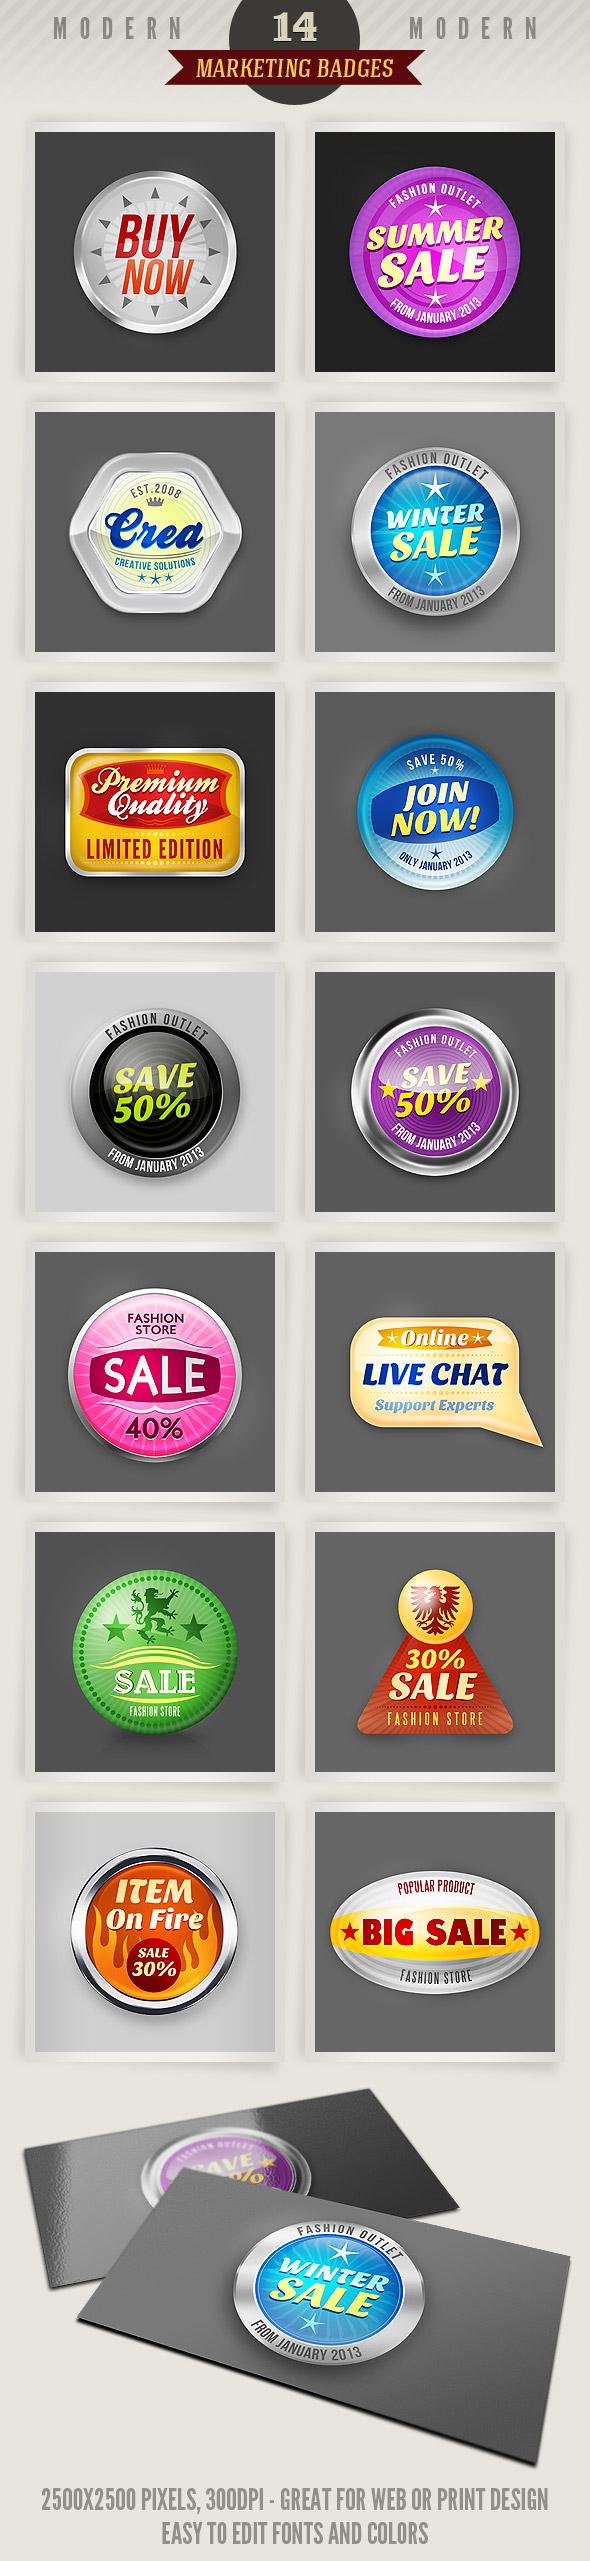 14 Modern Marketing Badges by hugoo13